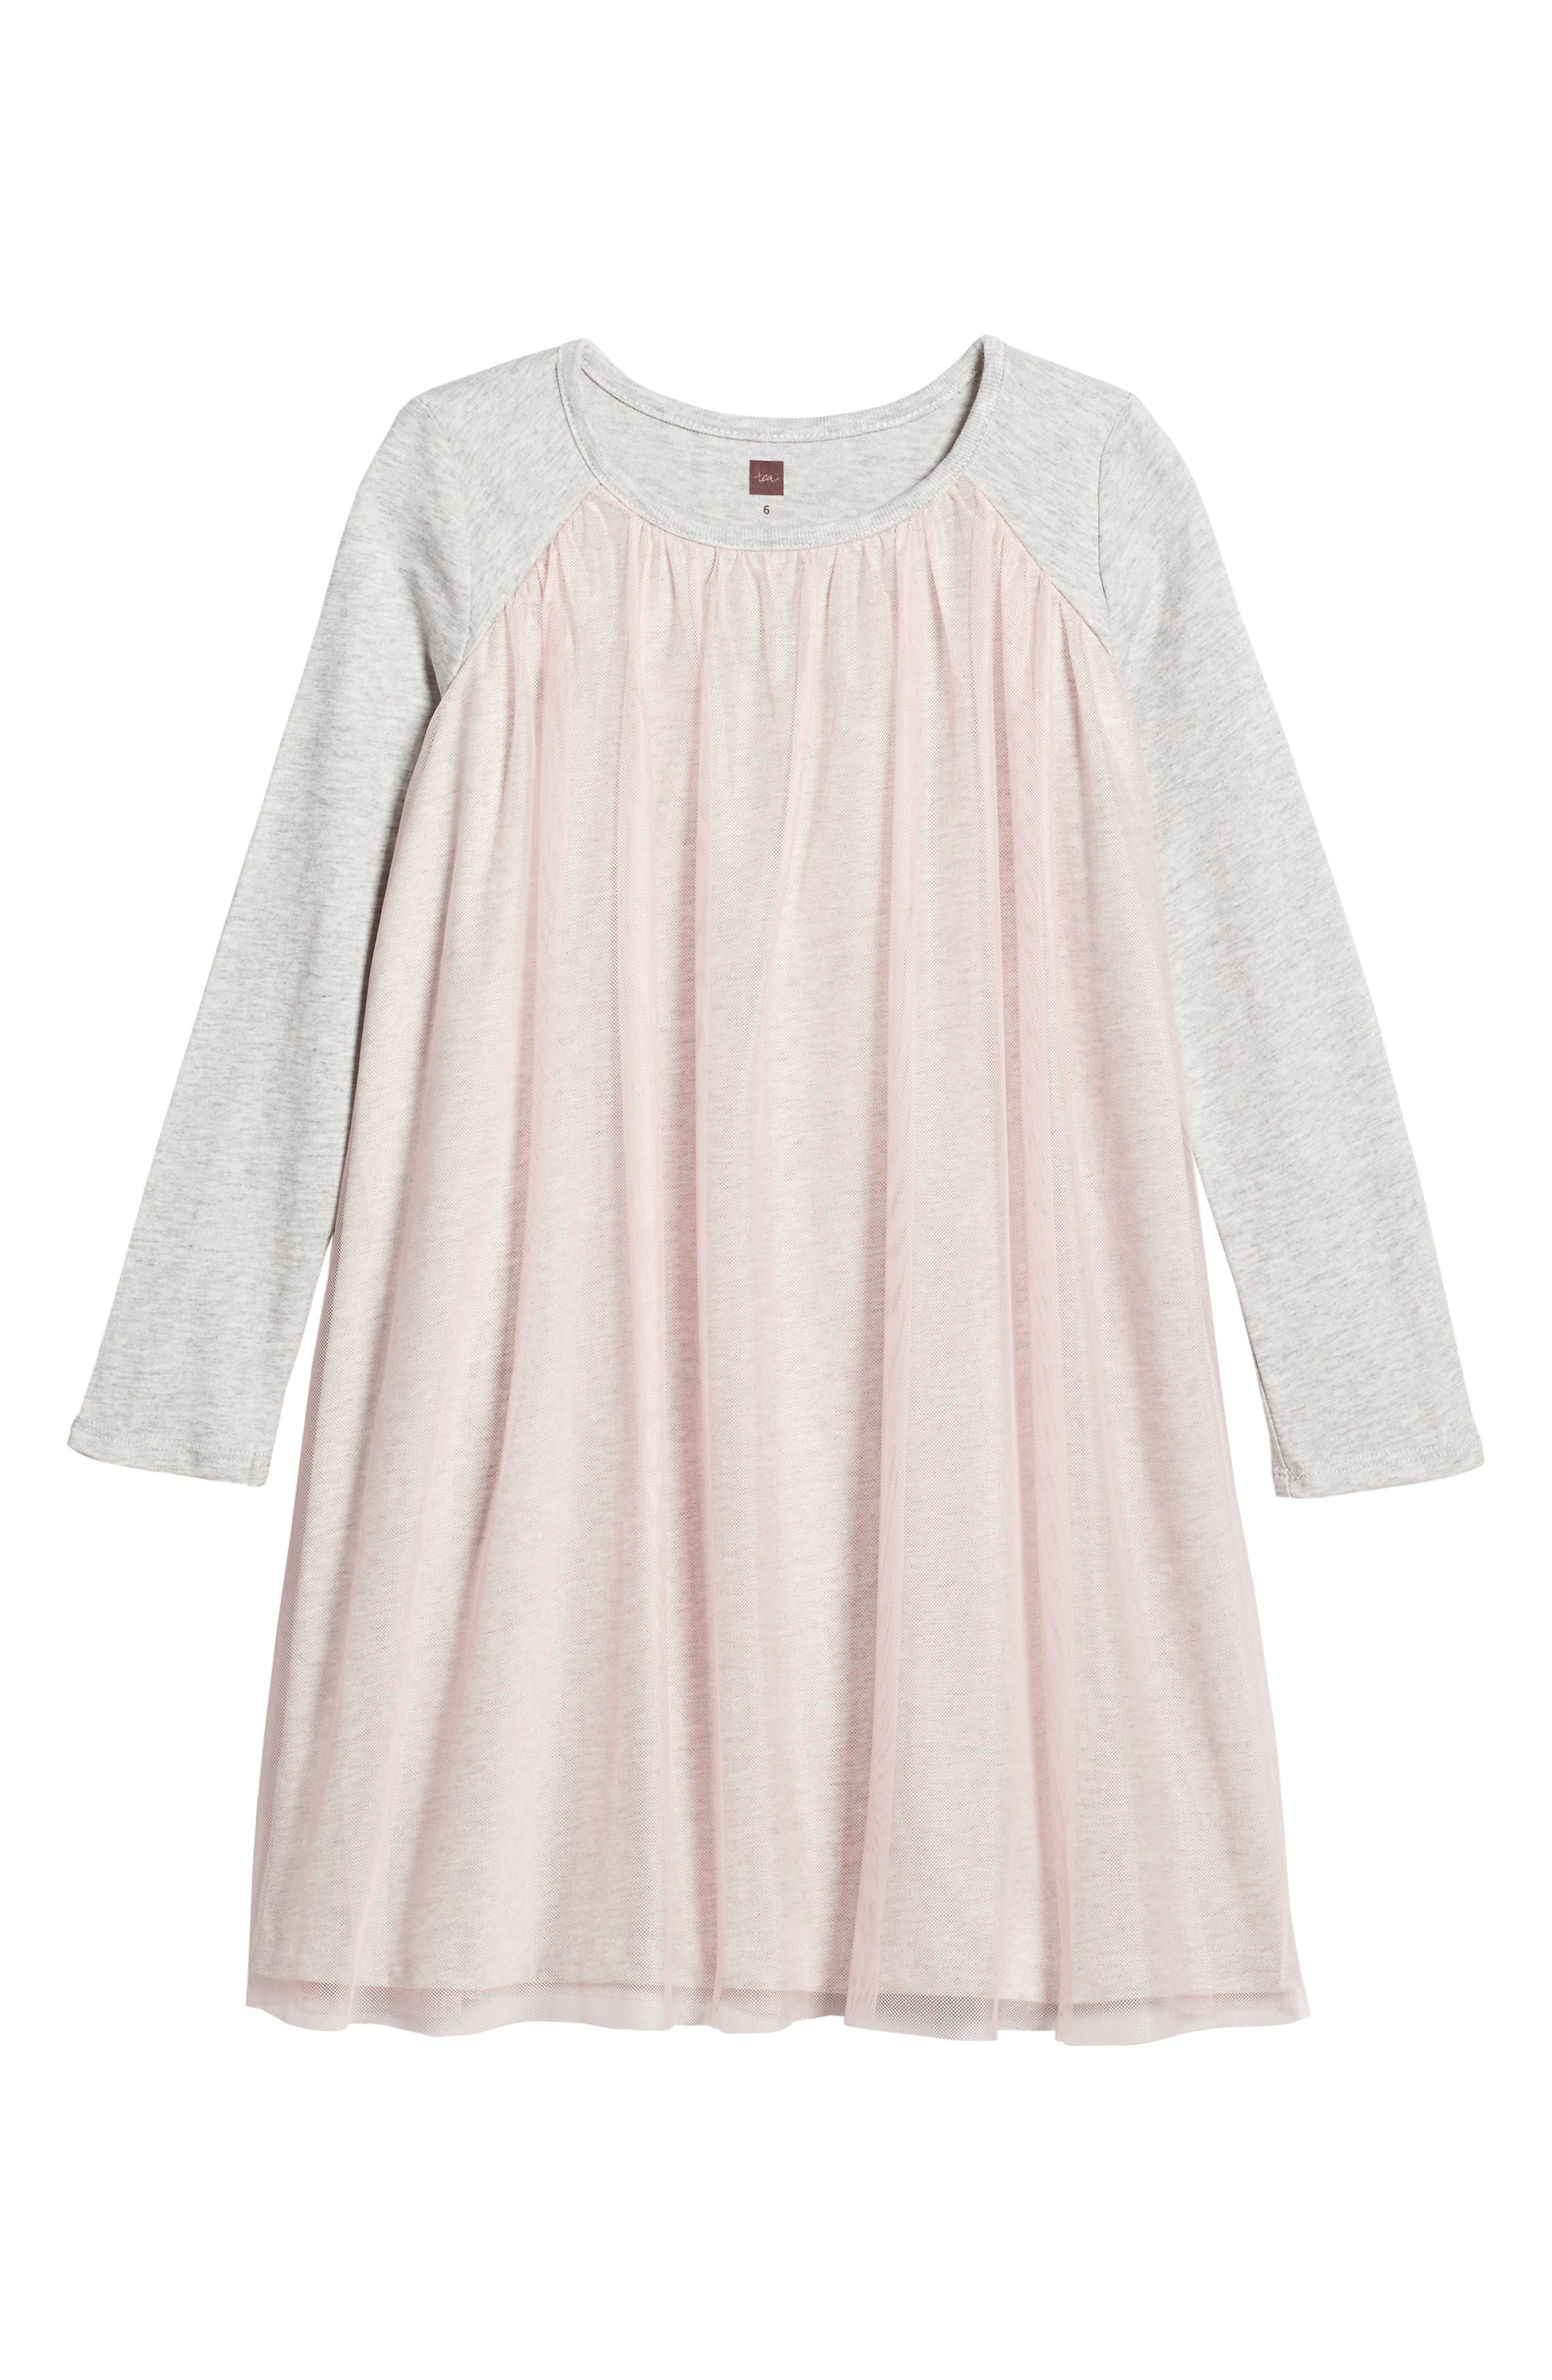 Mackenzie Tulle Dress,                             Main thumbnail 1, color,                             Soft Peach